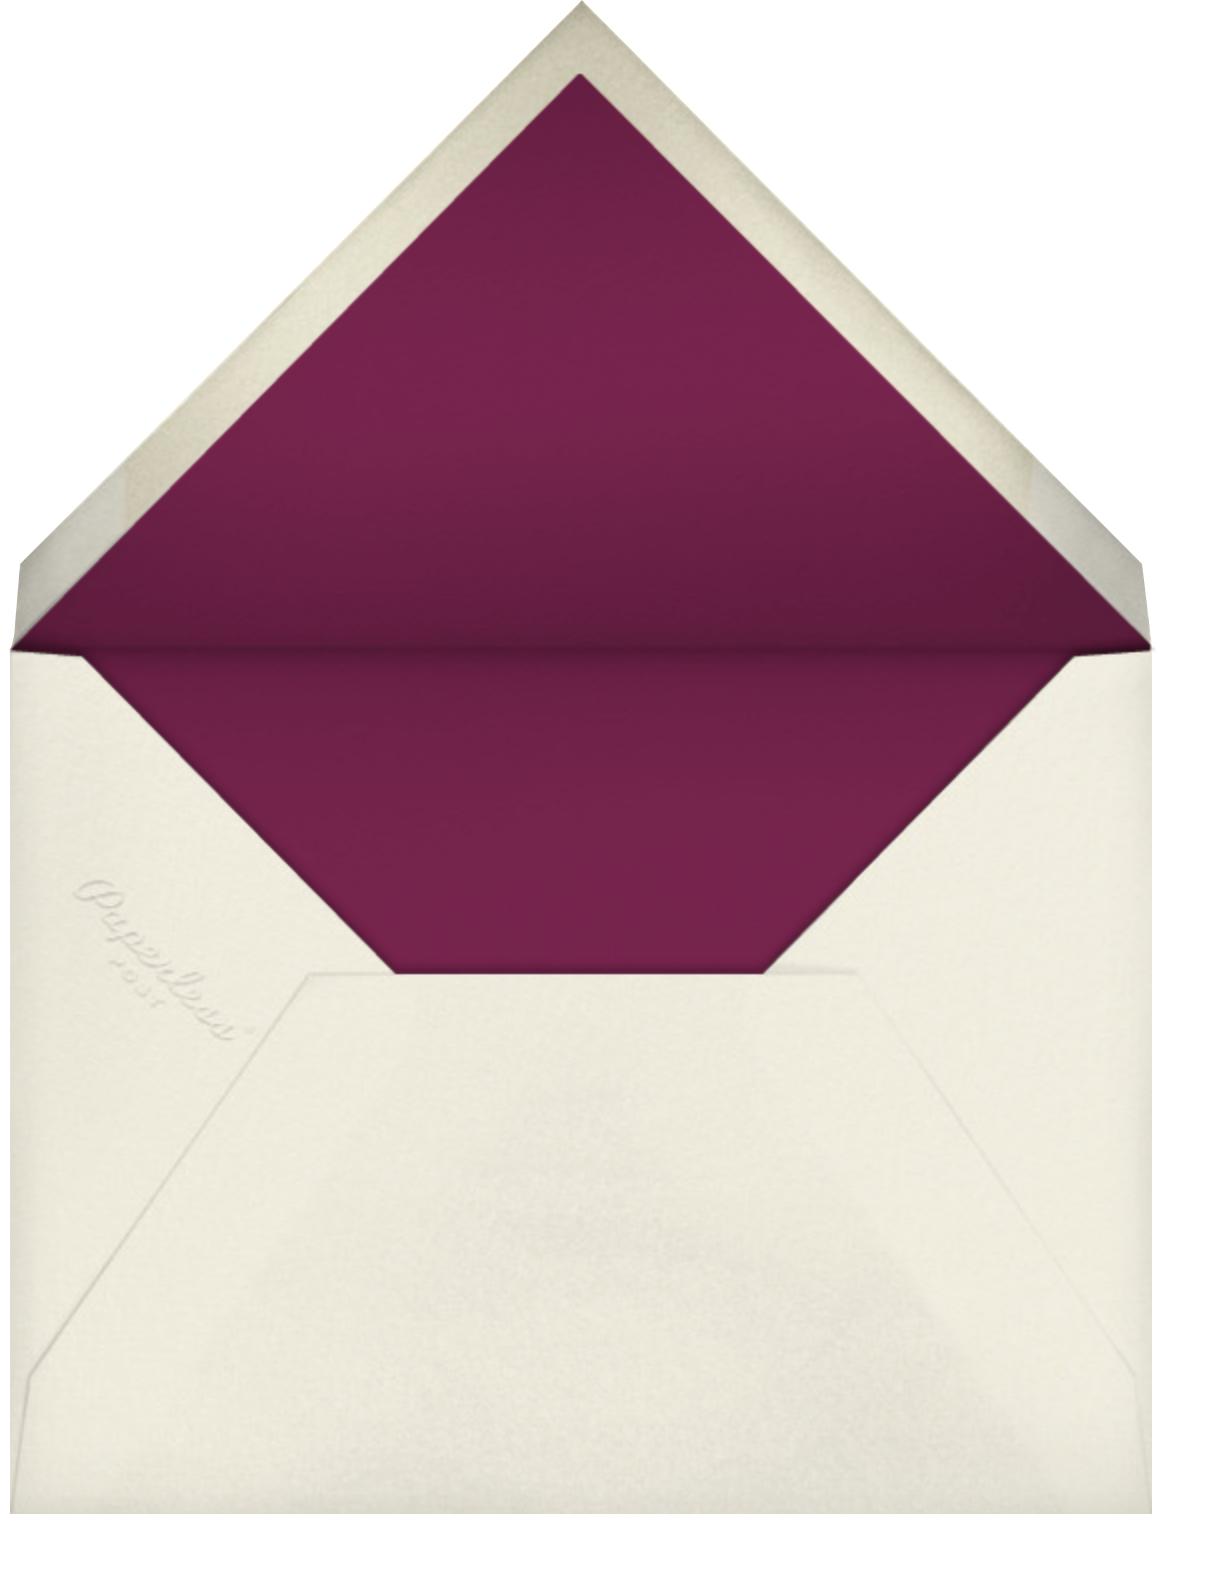 Ballet Birthday (Yelena Bryksenkova) - Fair - Red Cap Cards - Envelope